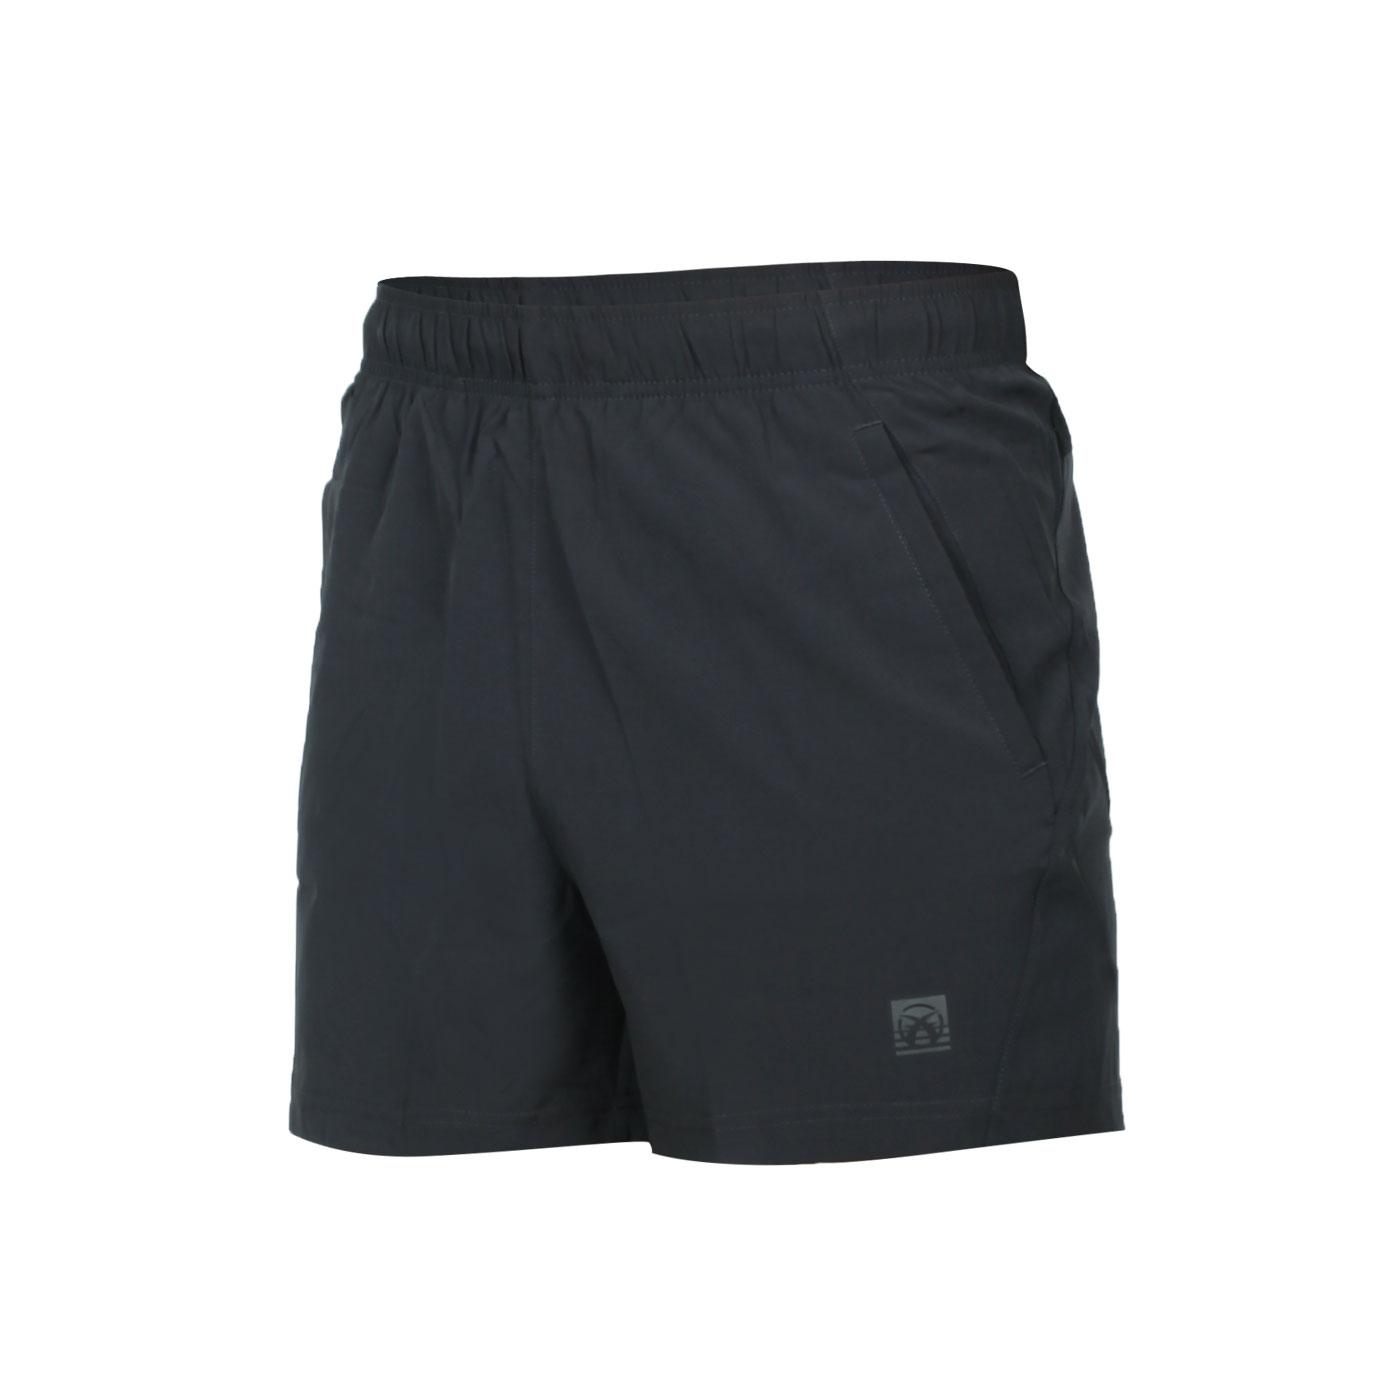 FIRESTAR 男款彈性平織慢跑短褲 C1710-15